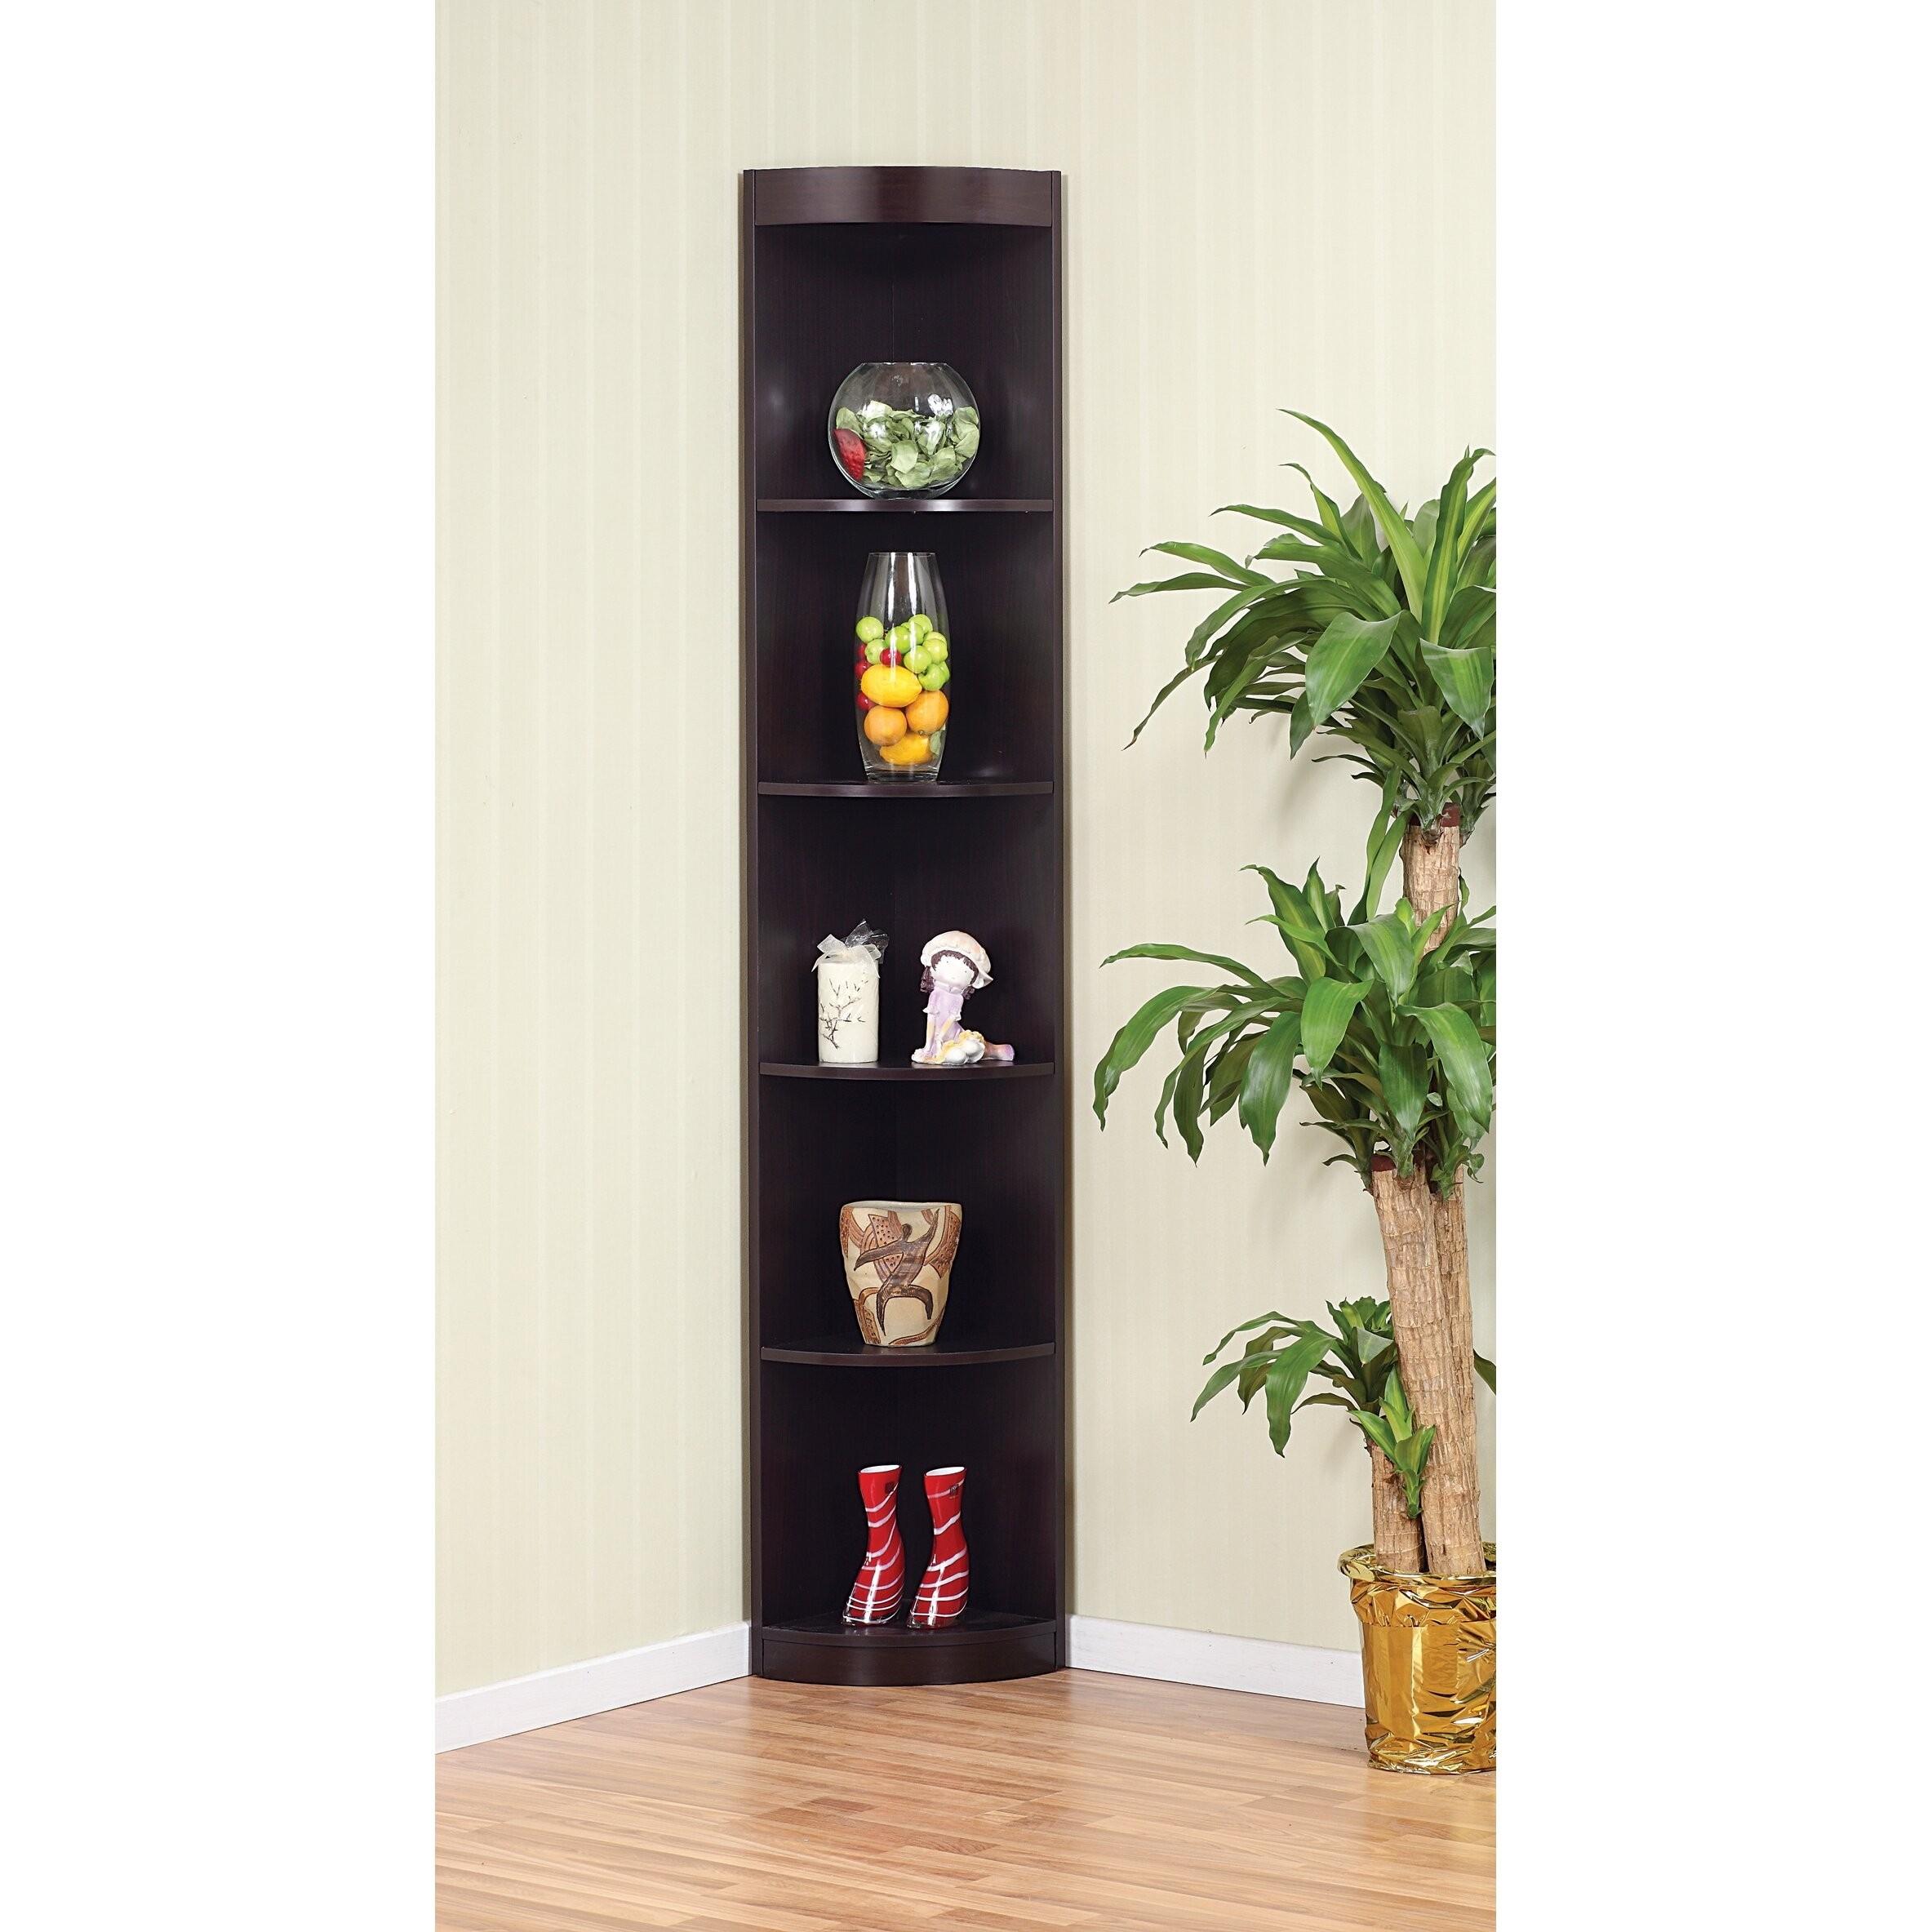 Exceptional Enitial Lab Corner 5 Shelf Display Stand/Bookshelf